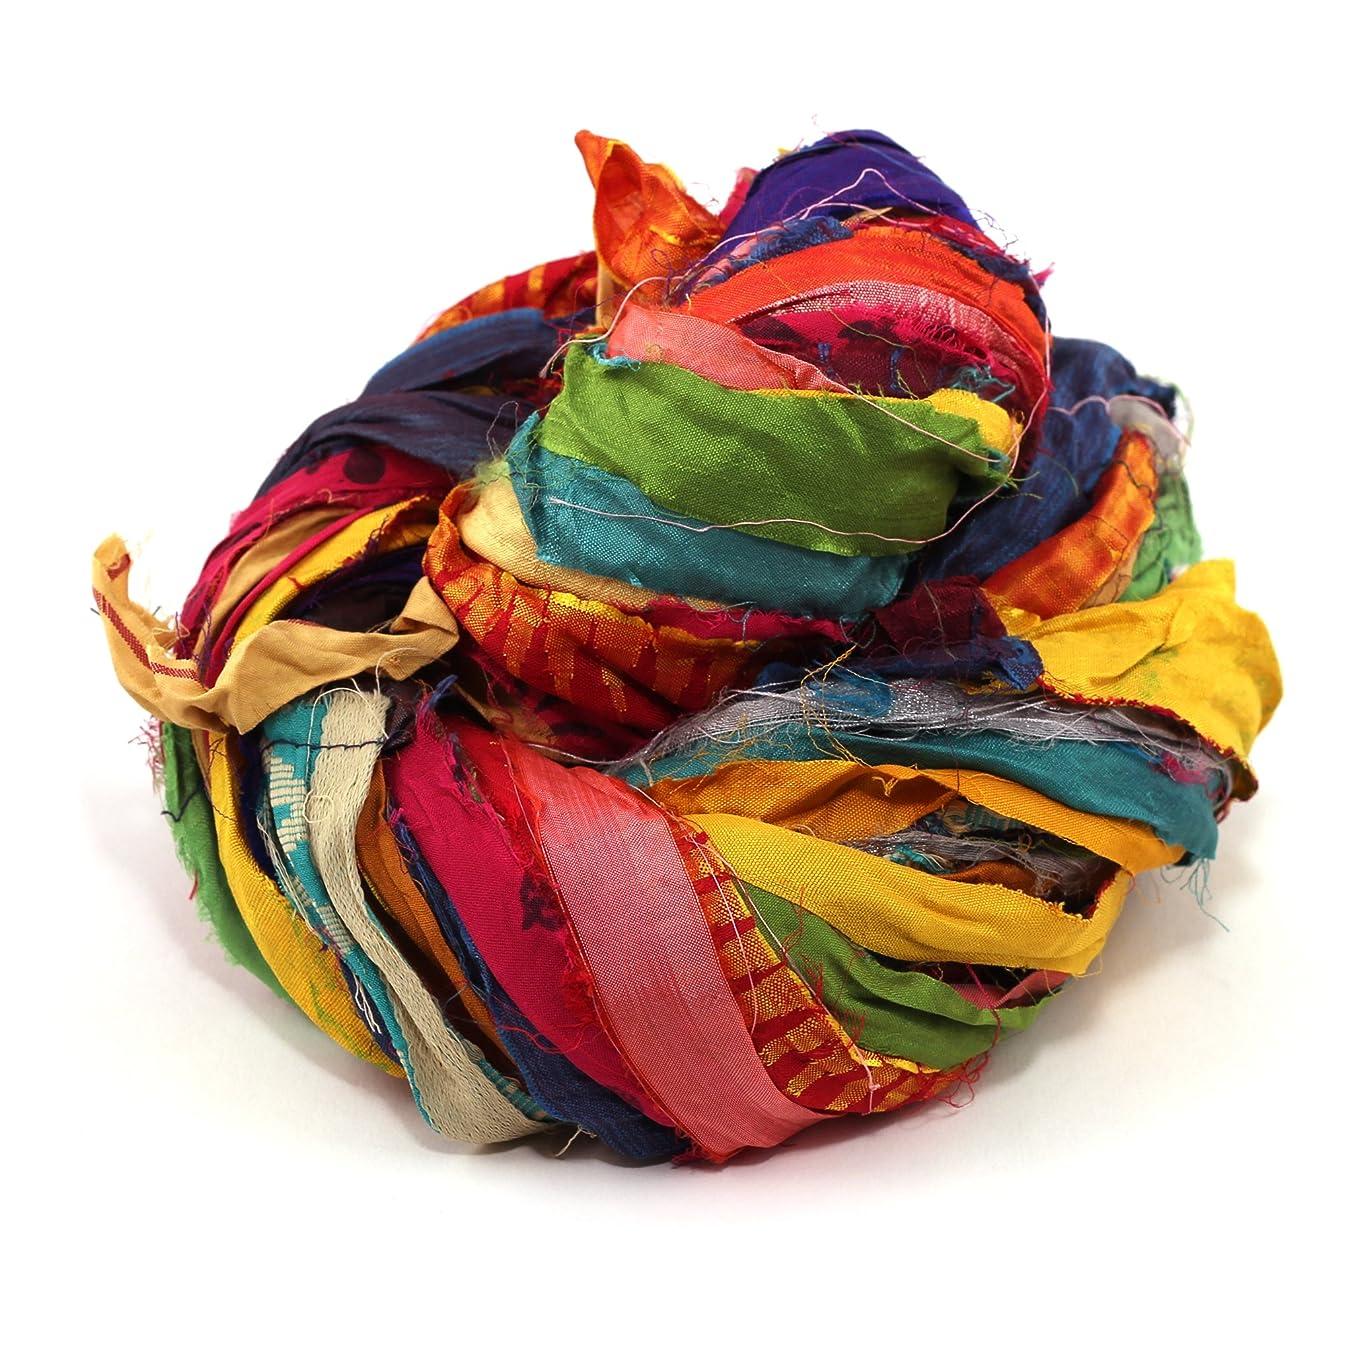 Darn Good Yarn Recycled Handmade Sari Silk Ribbon At the Bahamas Multicolor Yarn   Silk Ribbon, Knitting Yarn, Crochet Yarn   Jewelry Making, Gift Wrapping Ribbon   100 grams, 55 yard